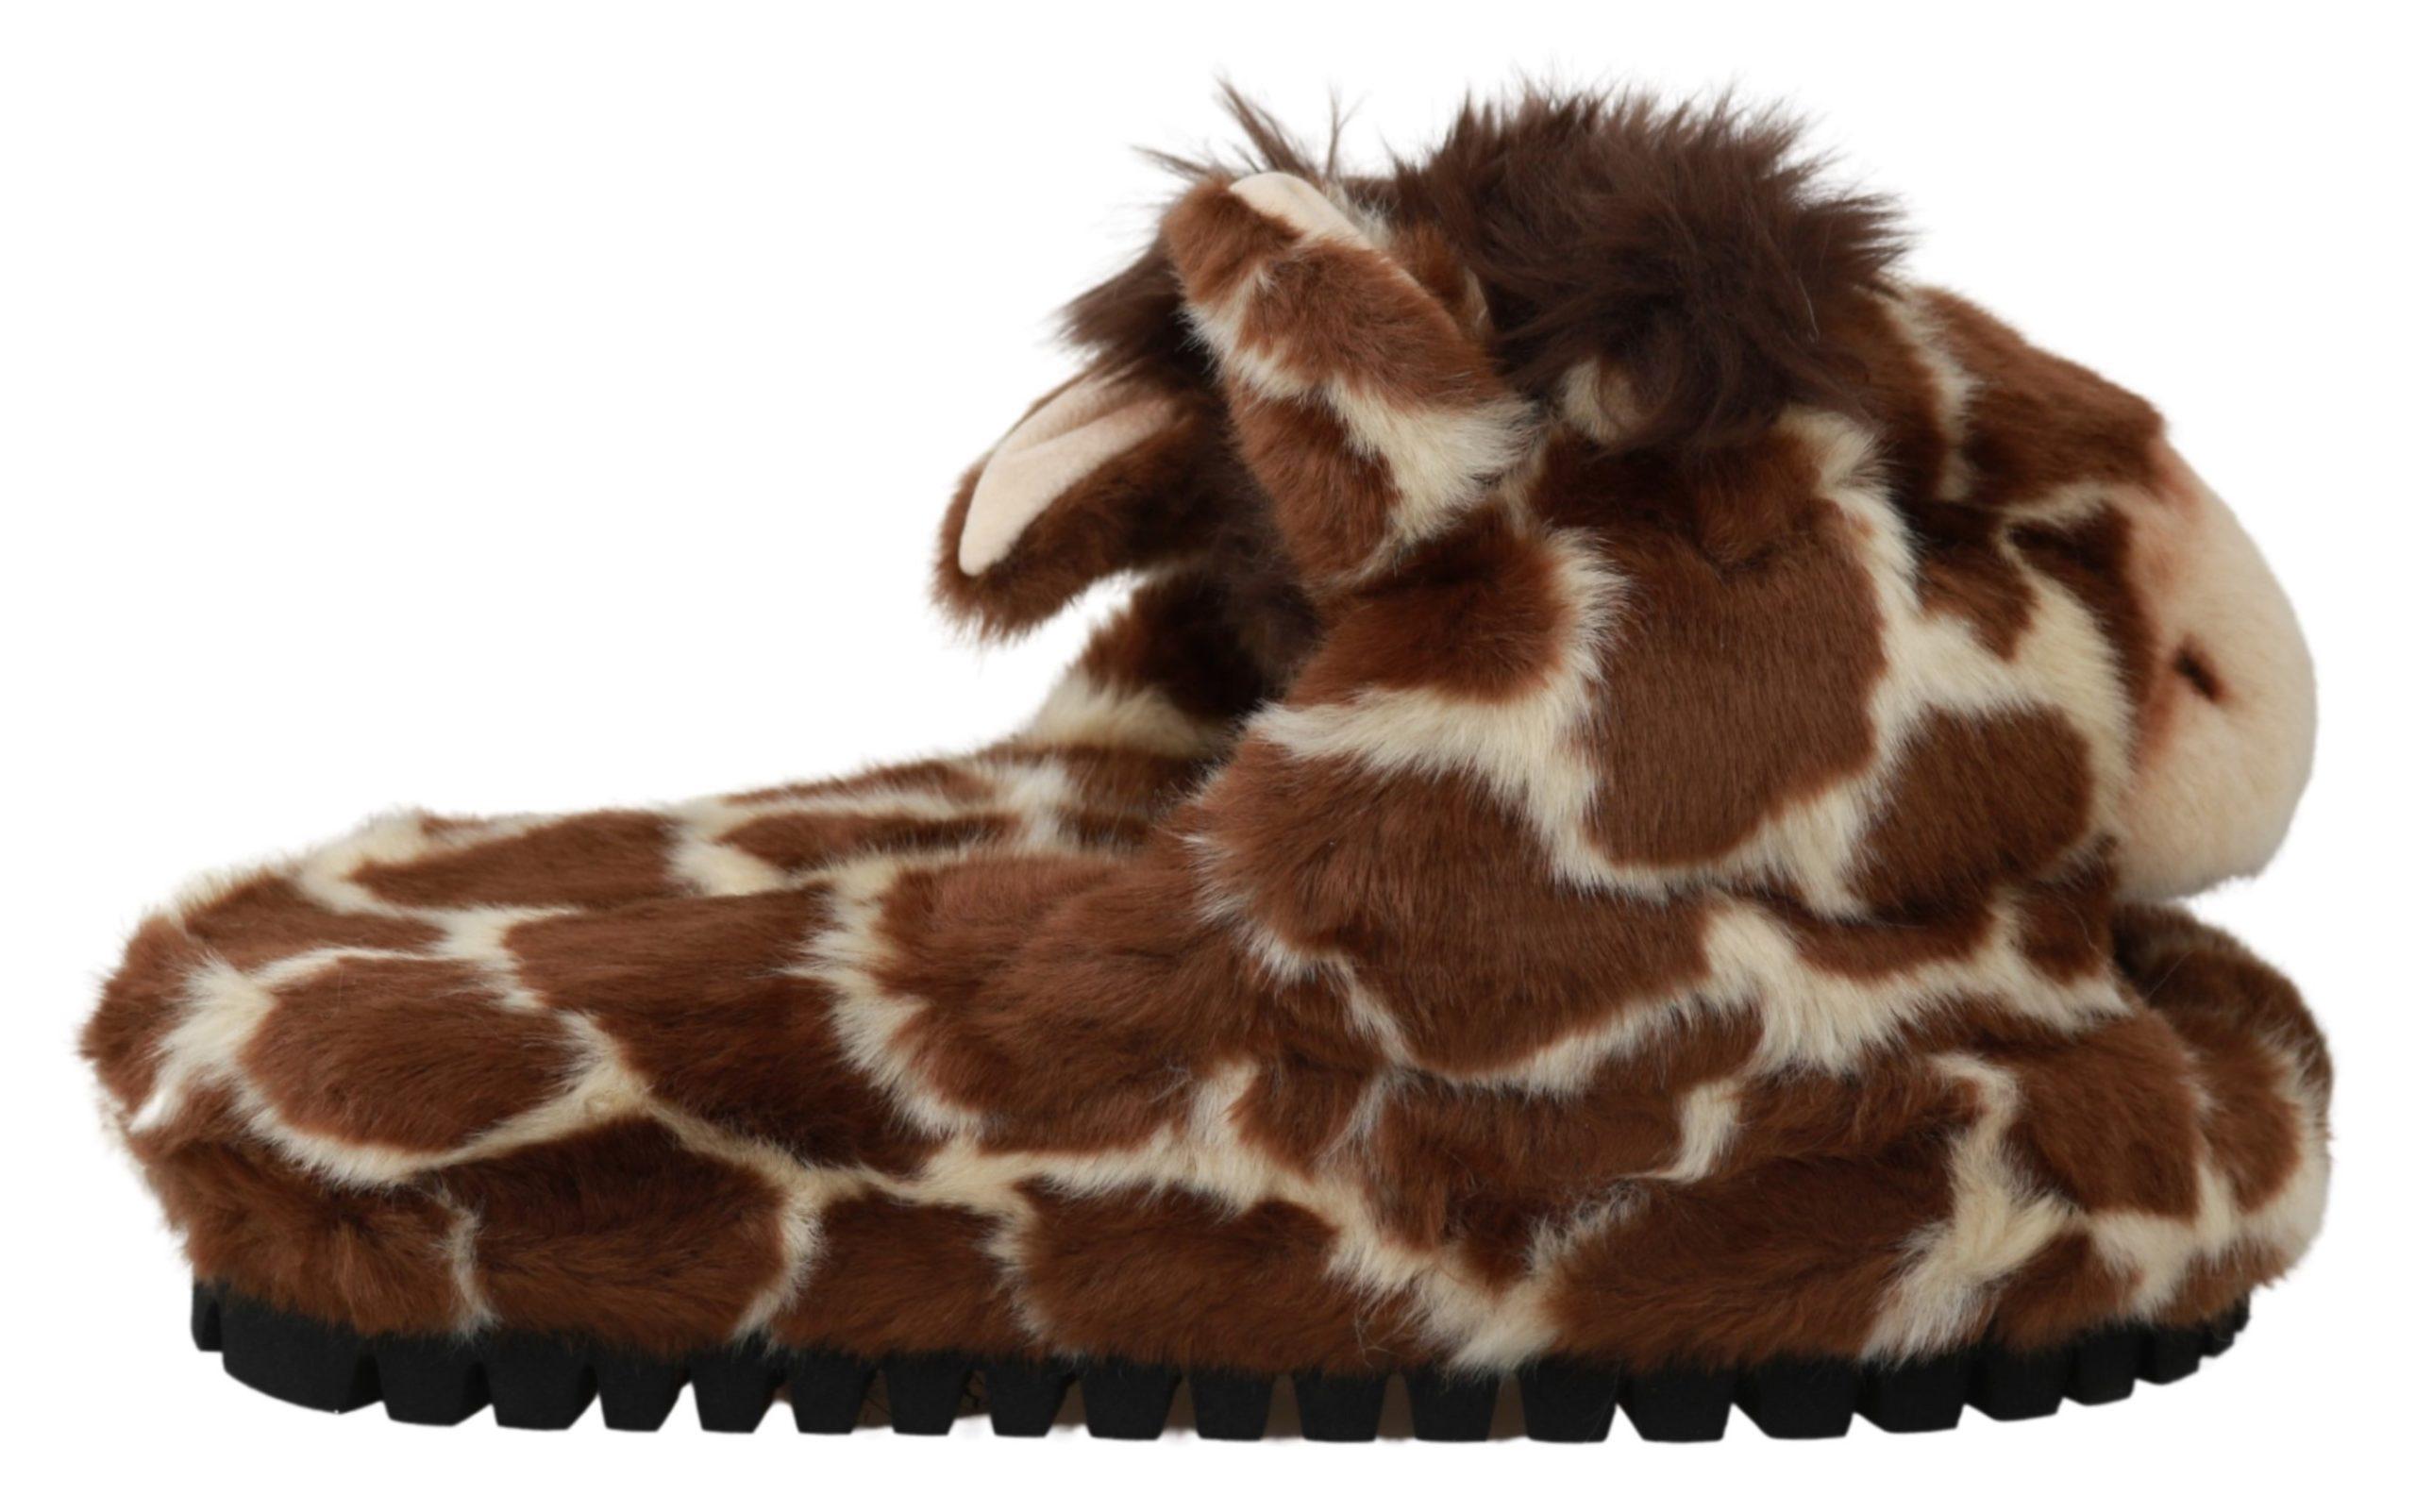 Dolce & Gabbana Women's Giraffe Slipper Brown LA6457 - EU35/US4.5